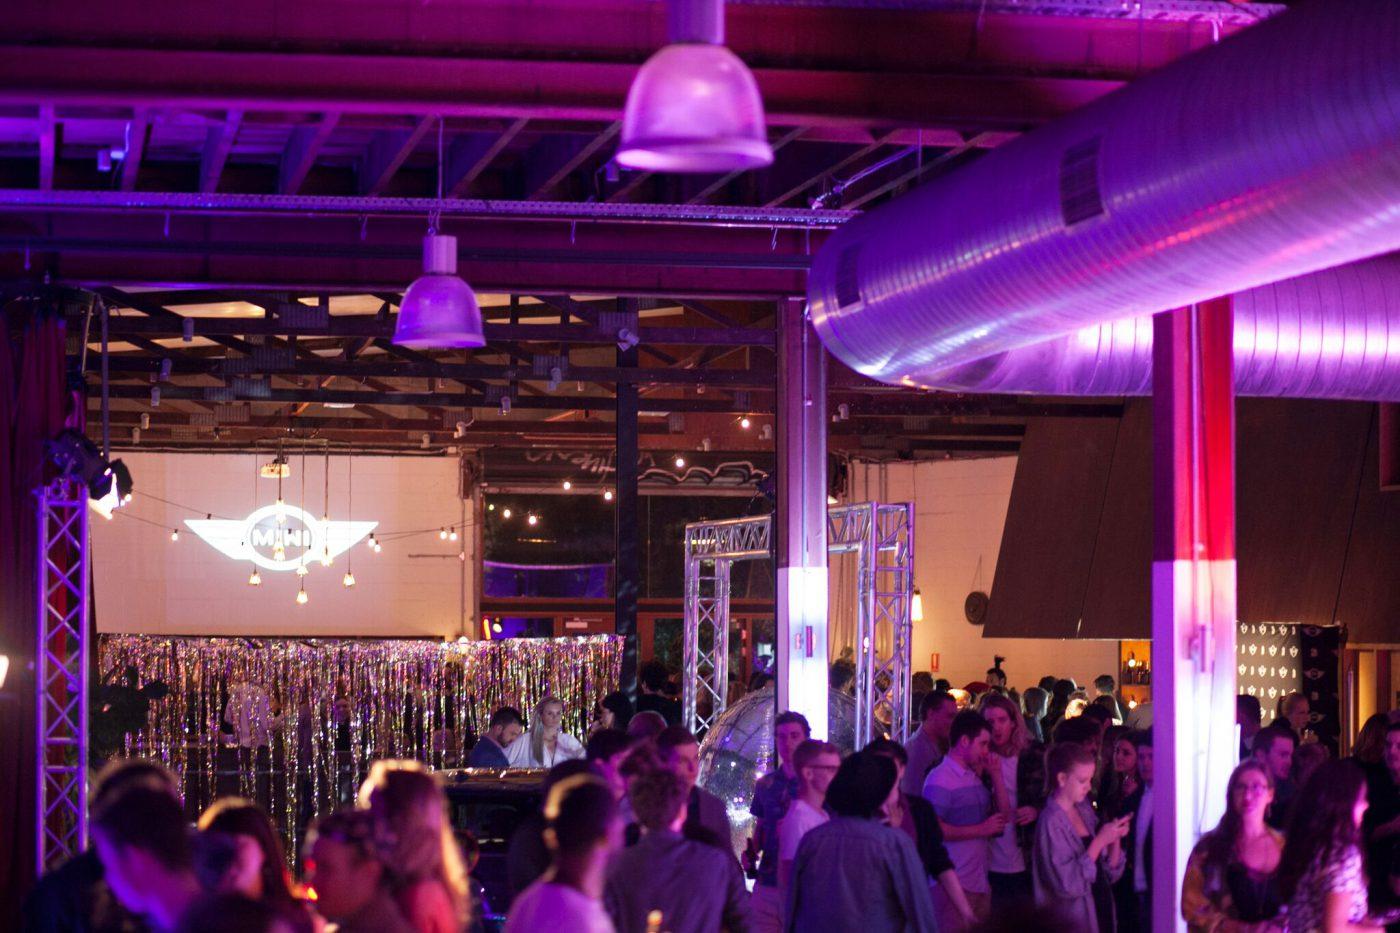 Photography Events Brisbane Perth London Netherlands Nederland Events Lightspace Warehouse Industrial